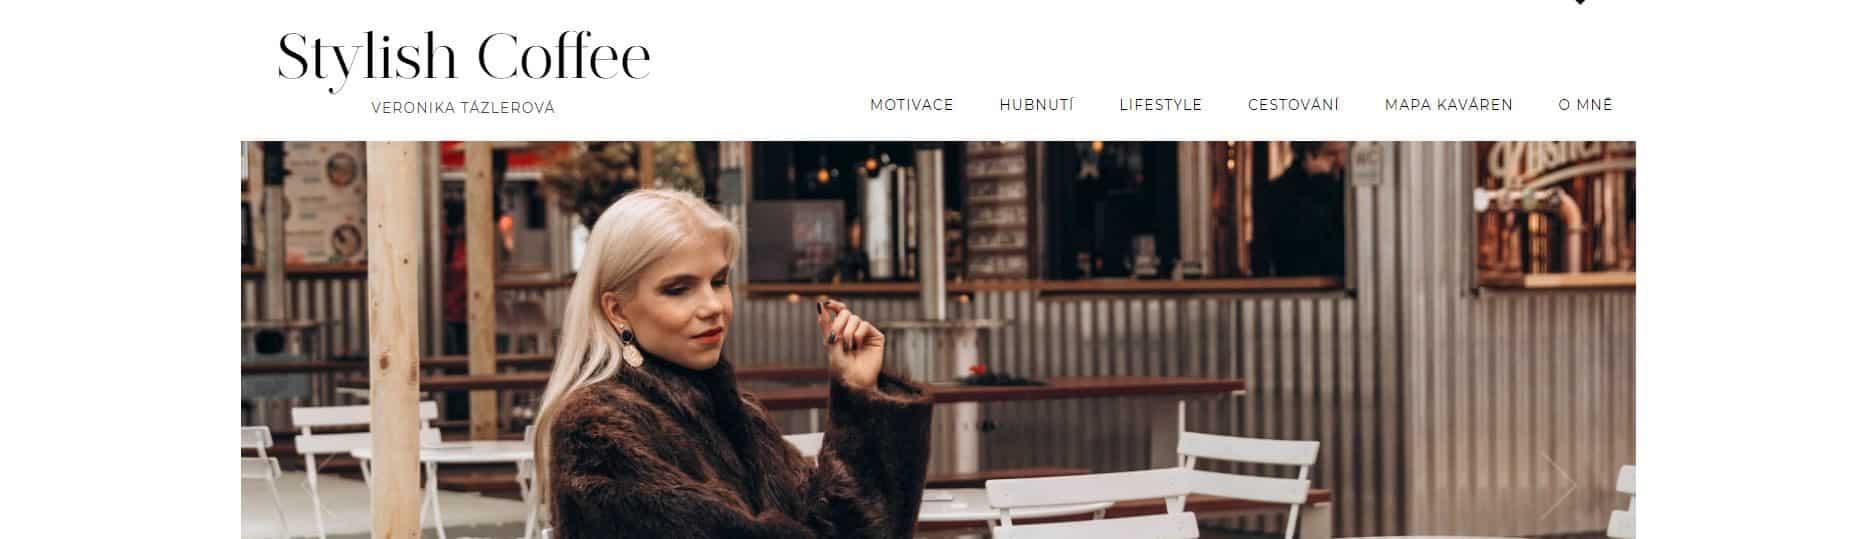 stylish coffee blog veronika tazlerová